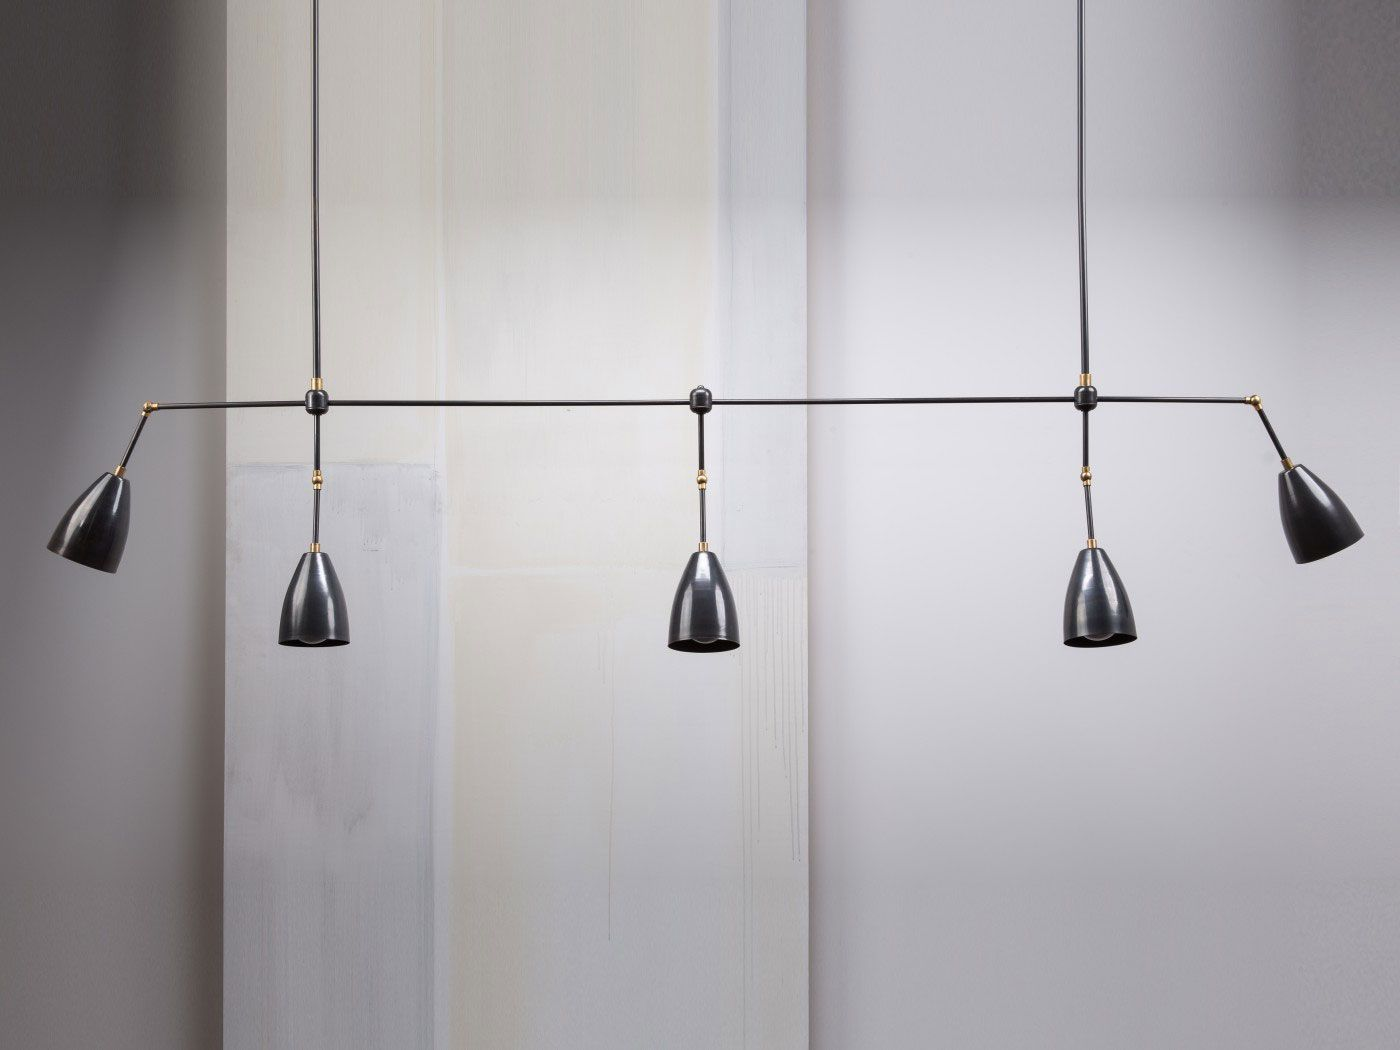 studios lighting and new york on pinterest apparatus lighting